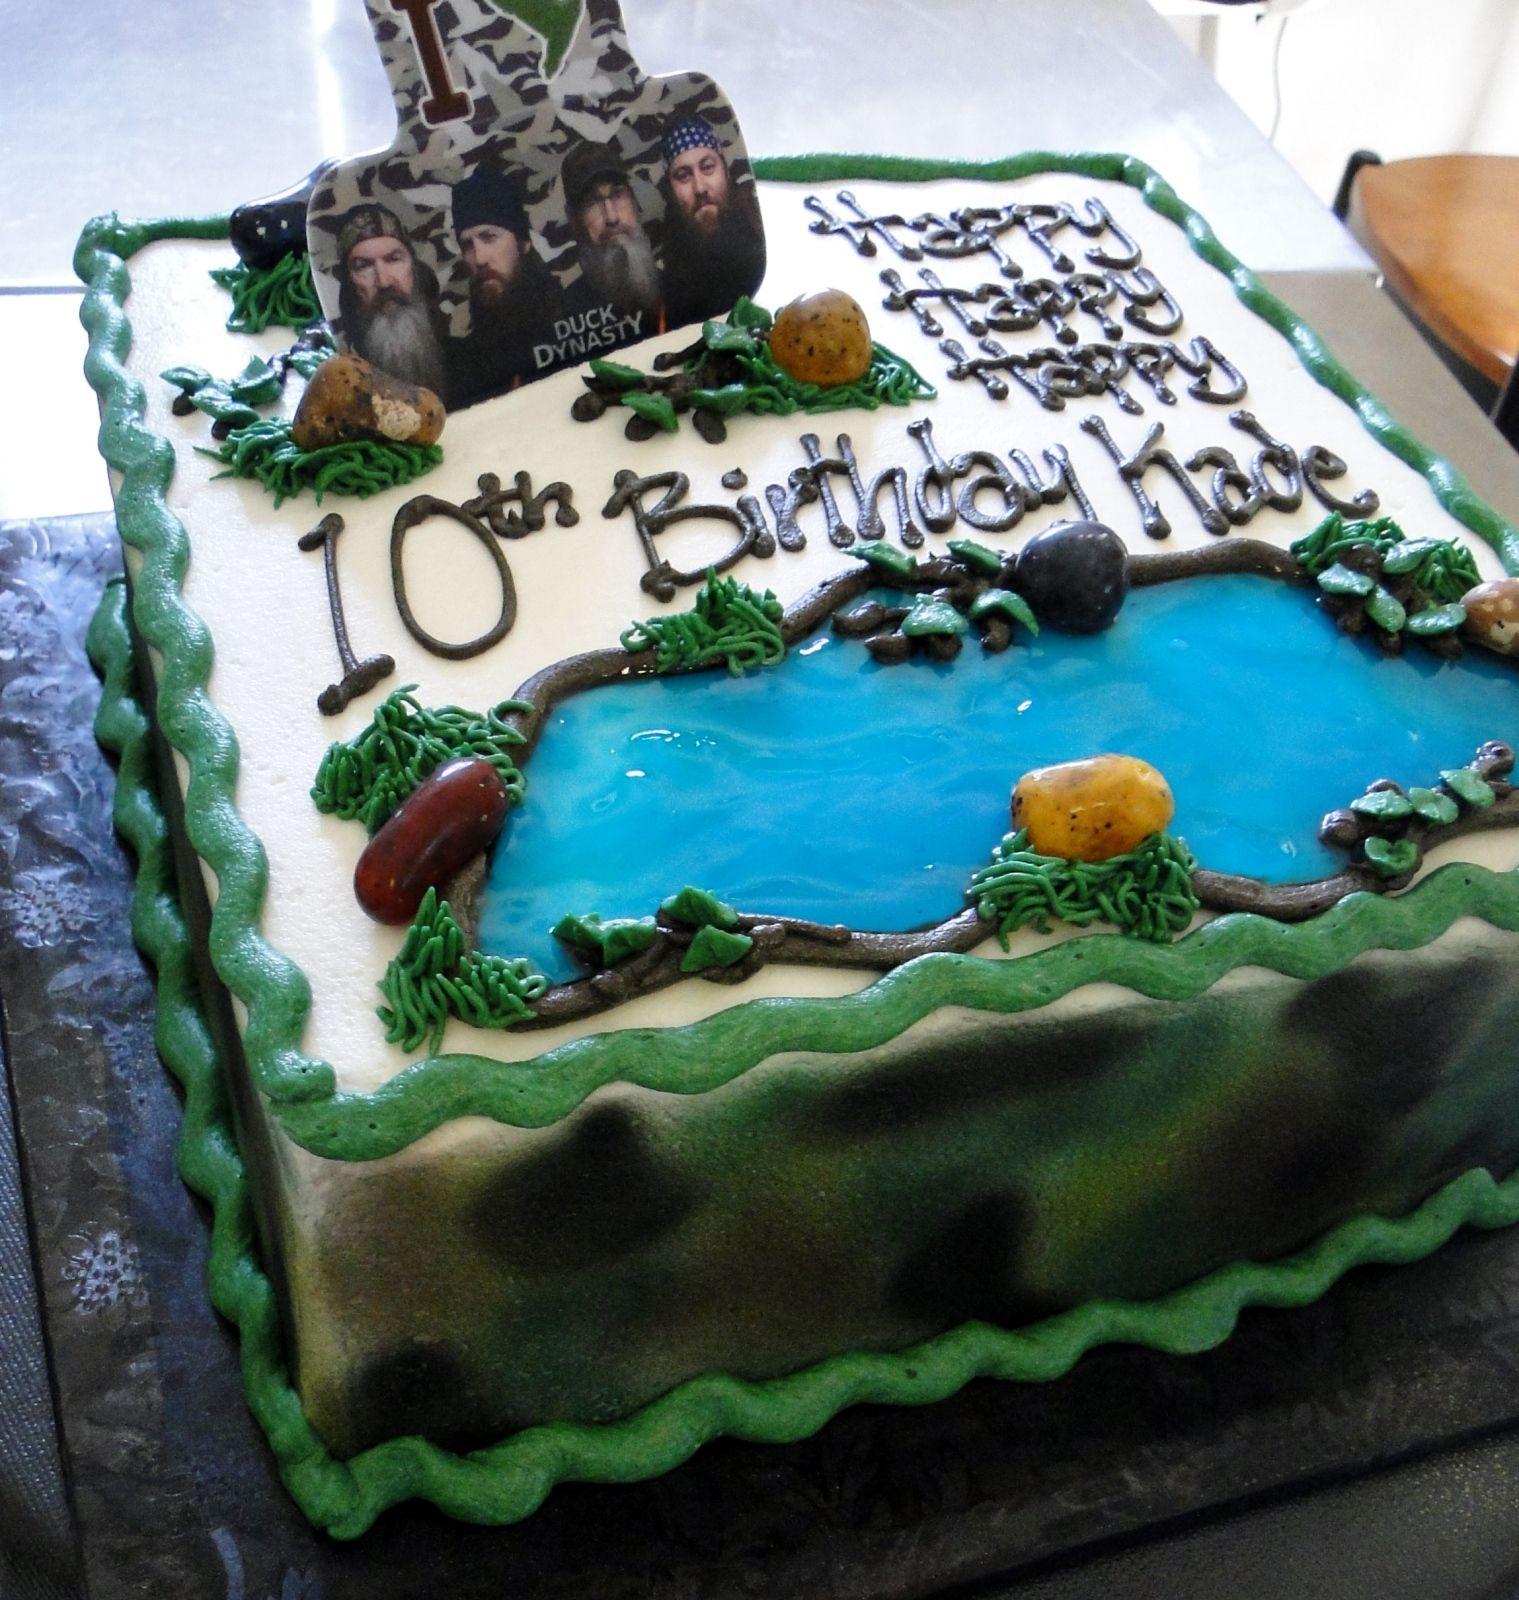 Duck Dynasty Cake The Swirl Cakes Creations Winston Salem NC